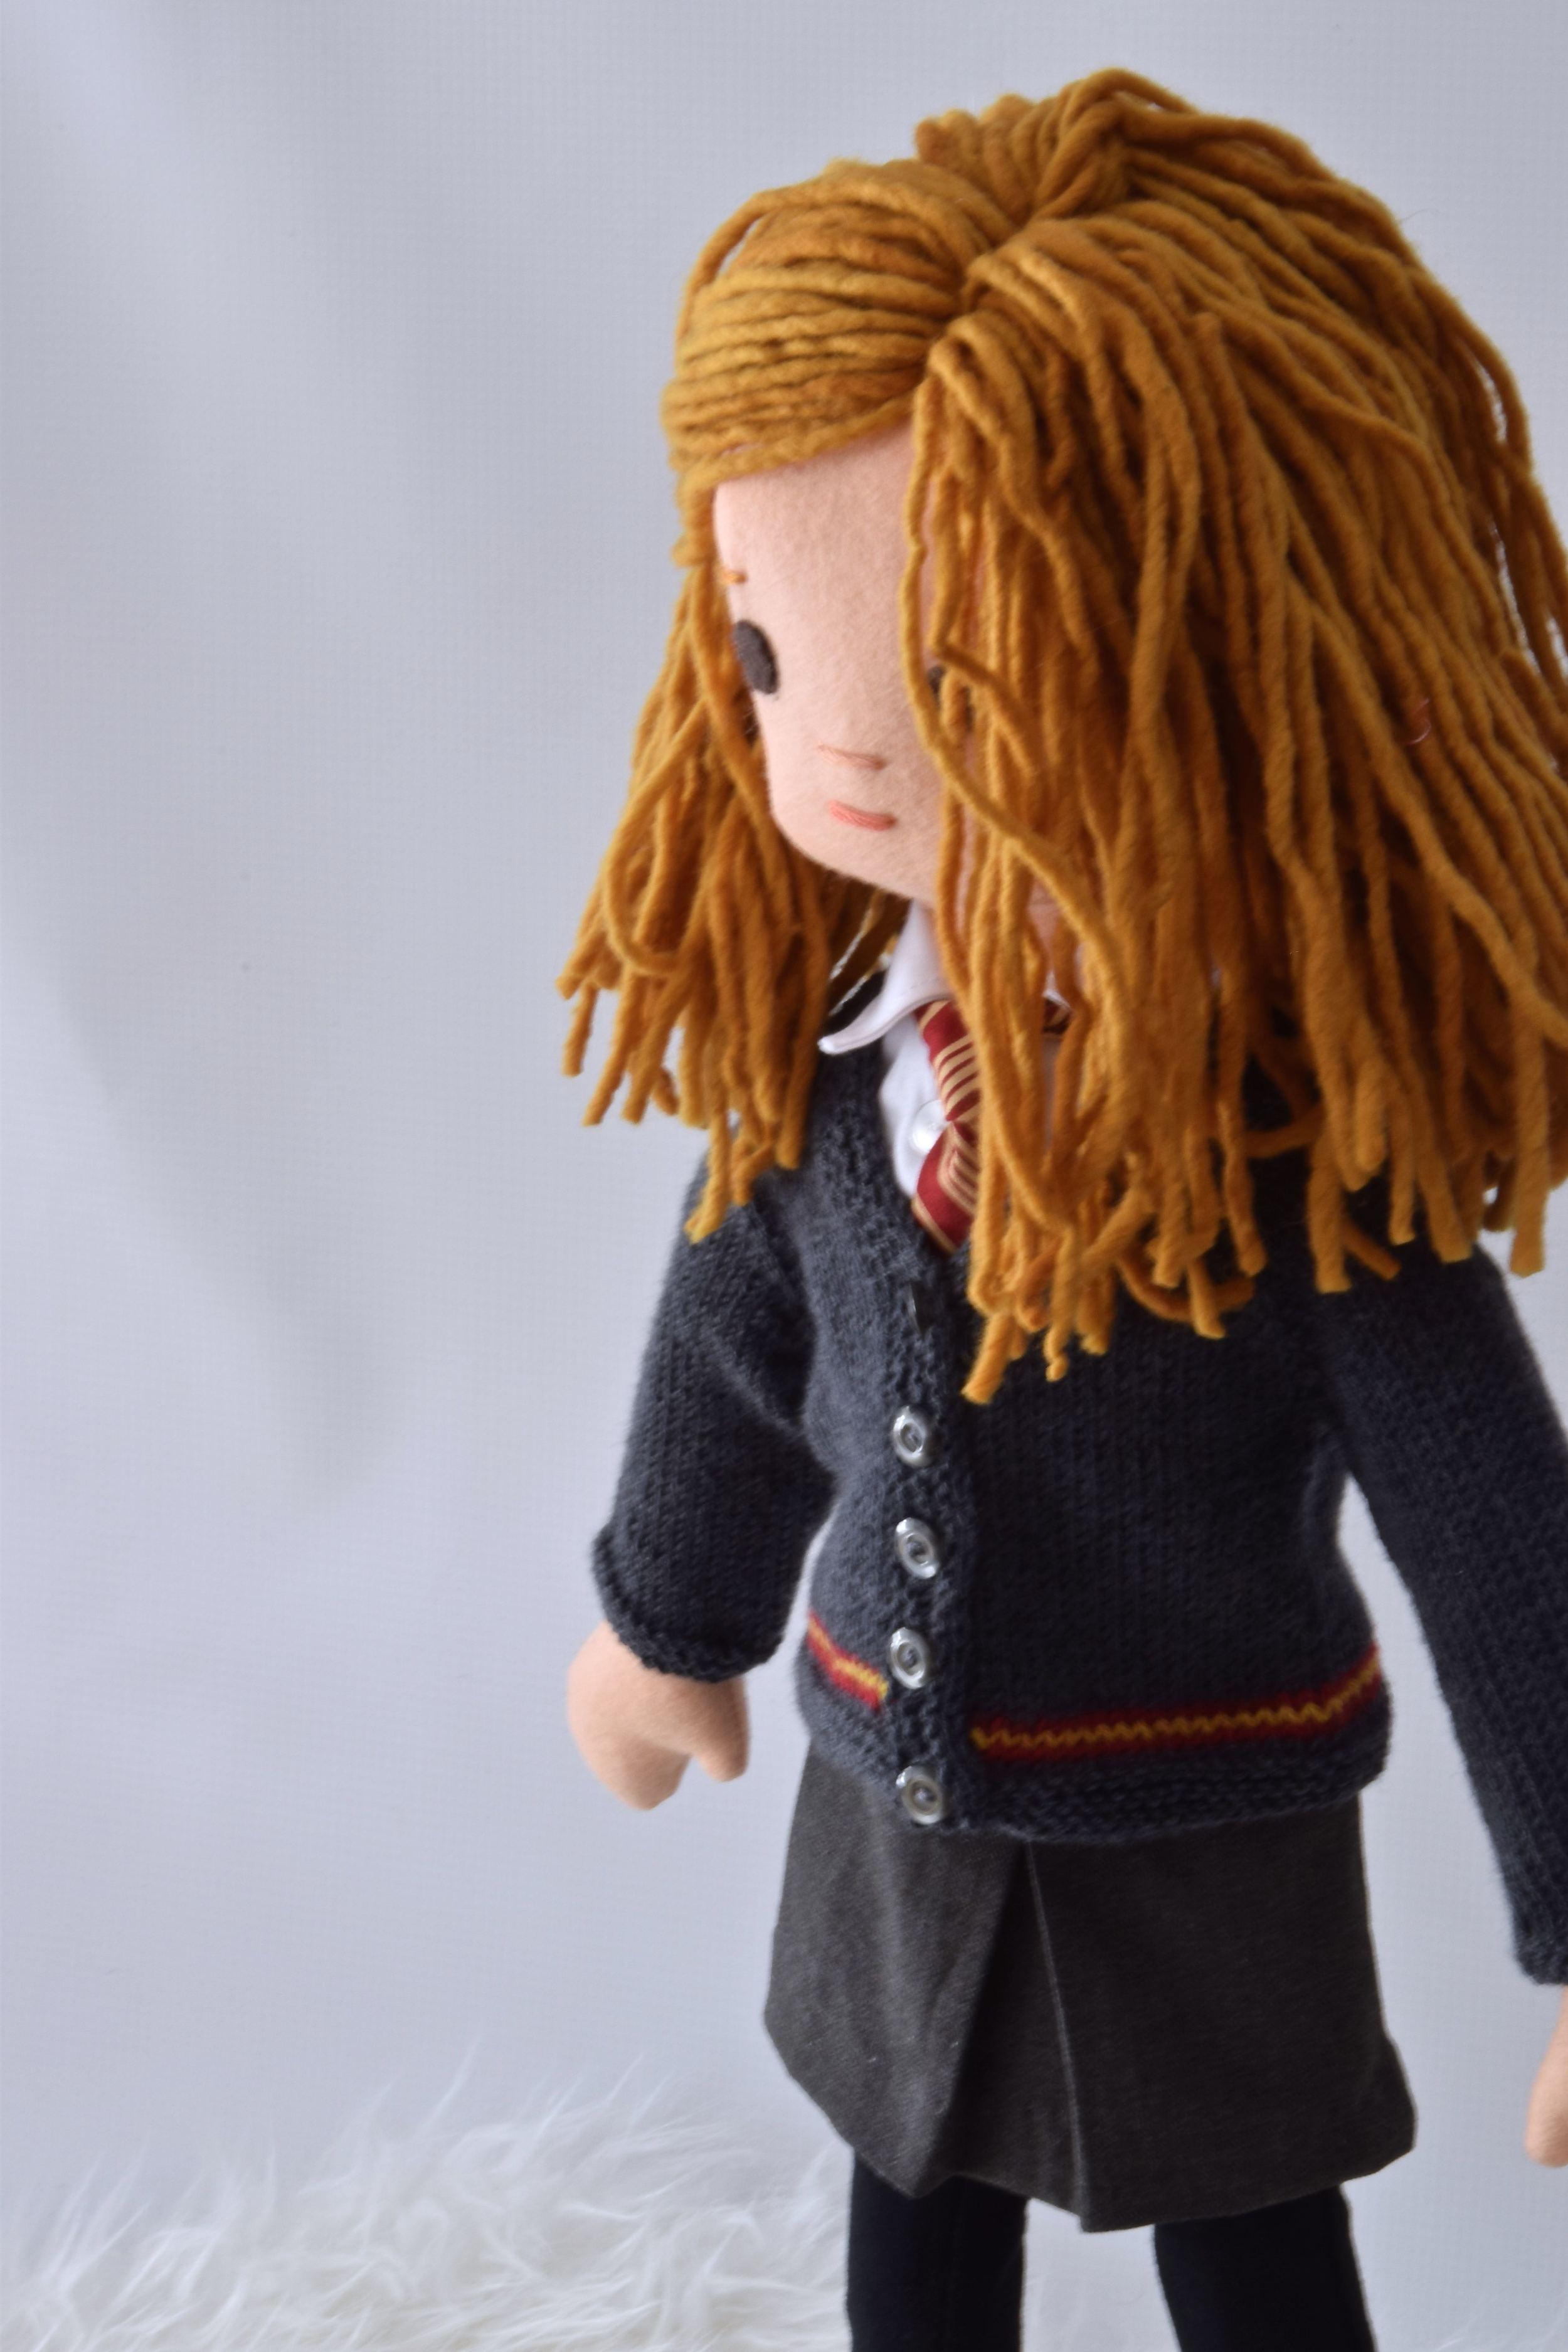 Harry Potter's Hermione Granger doll